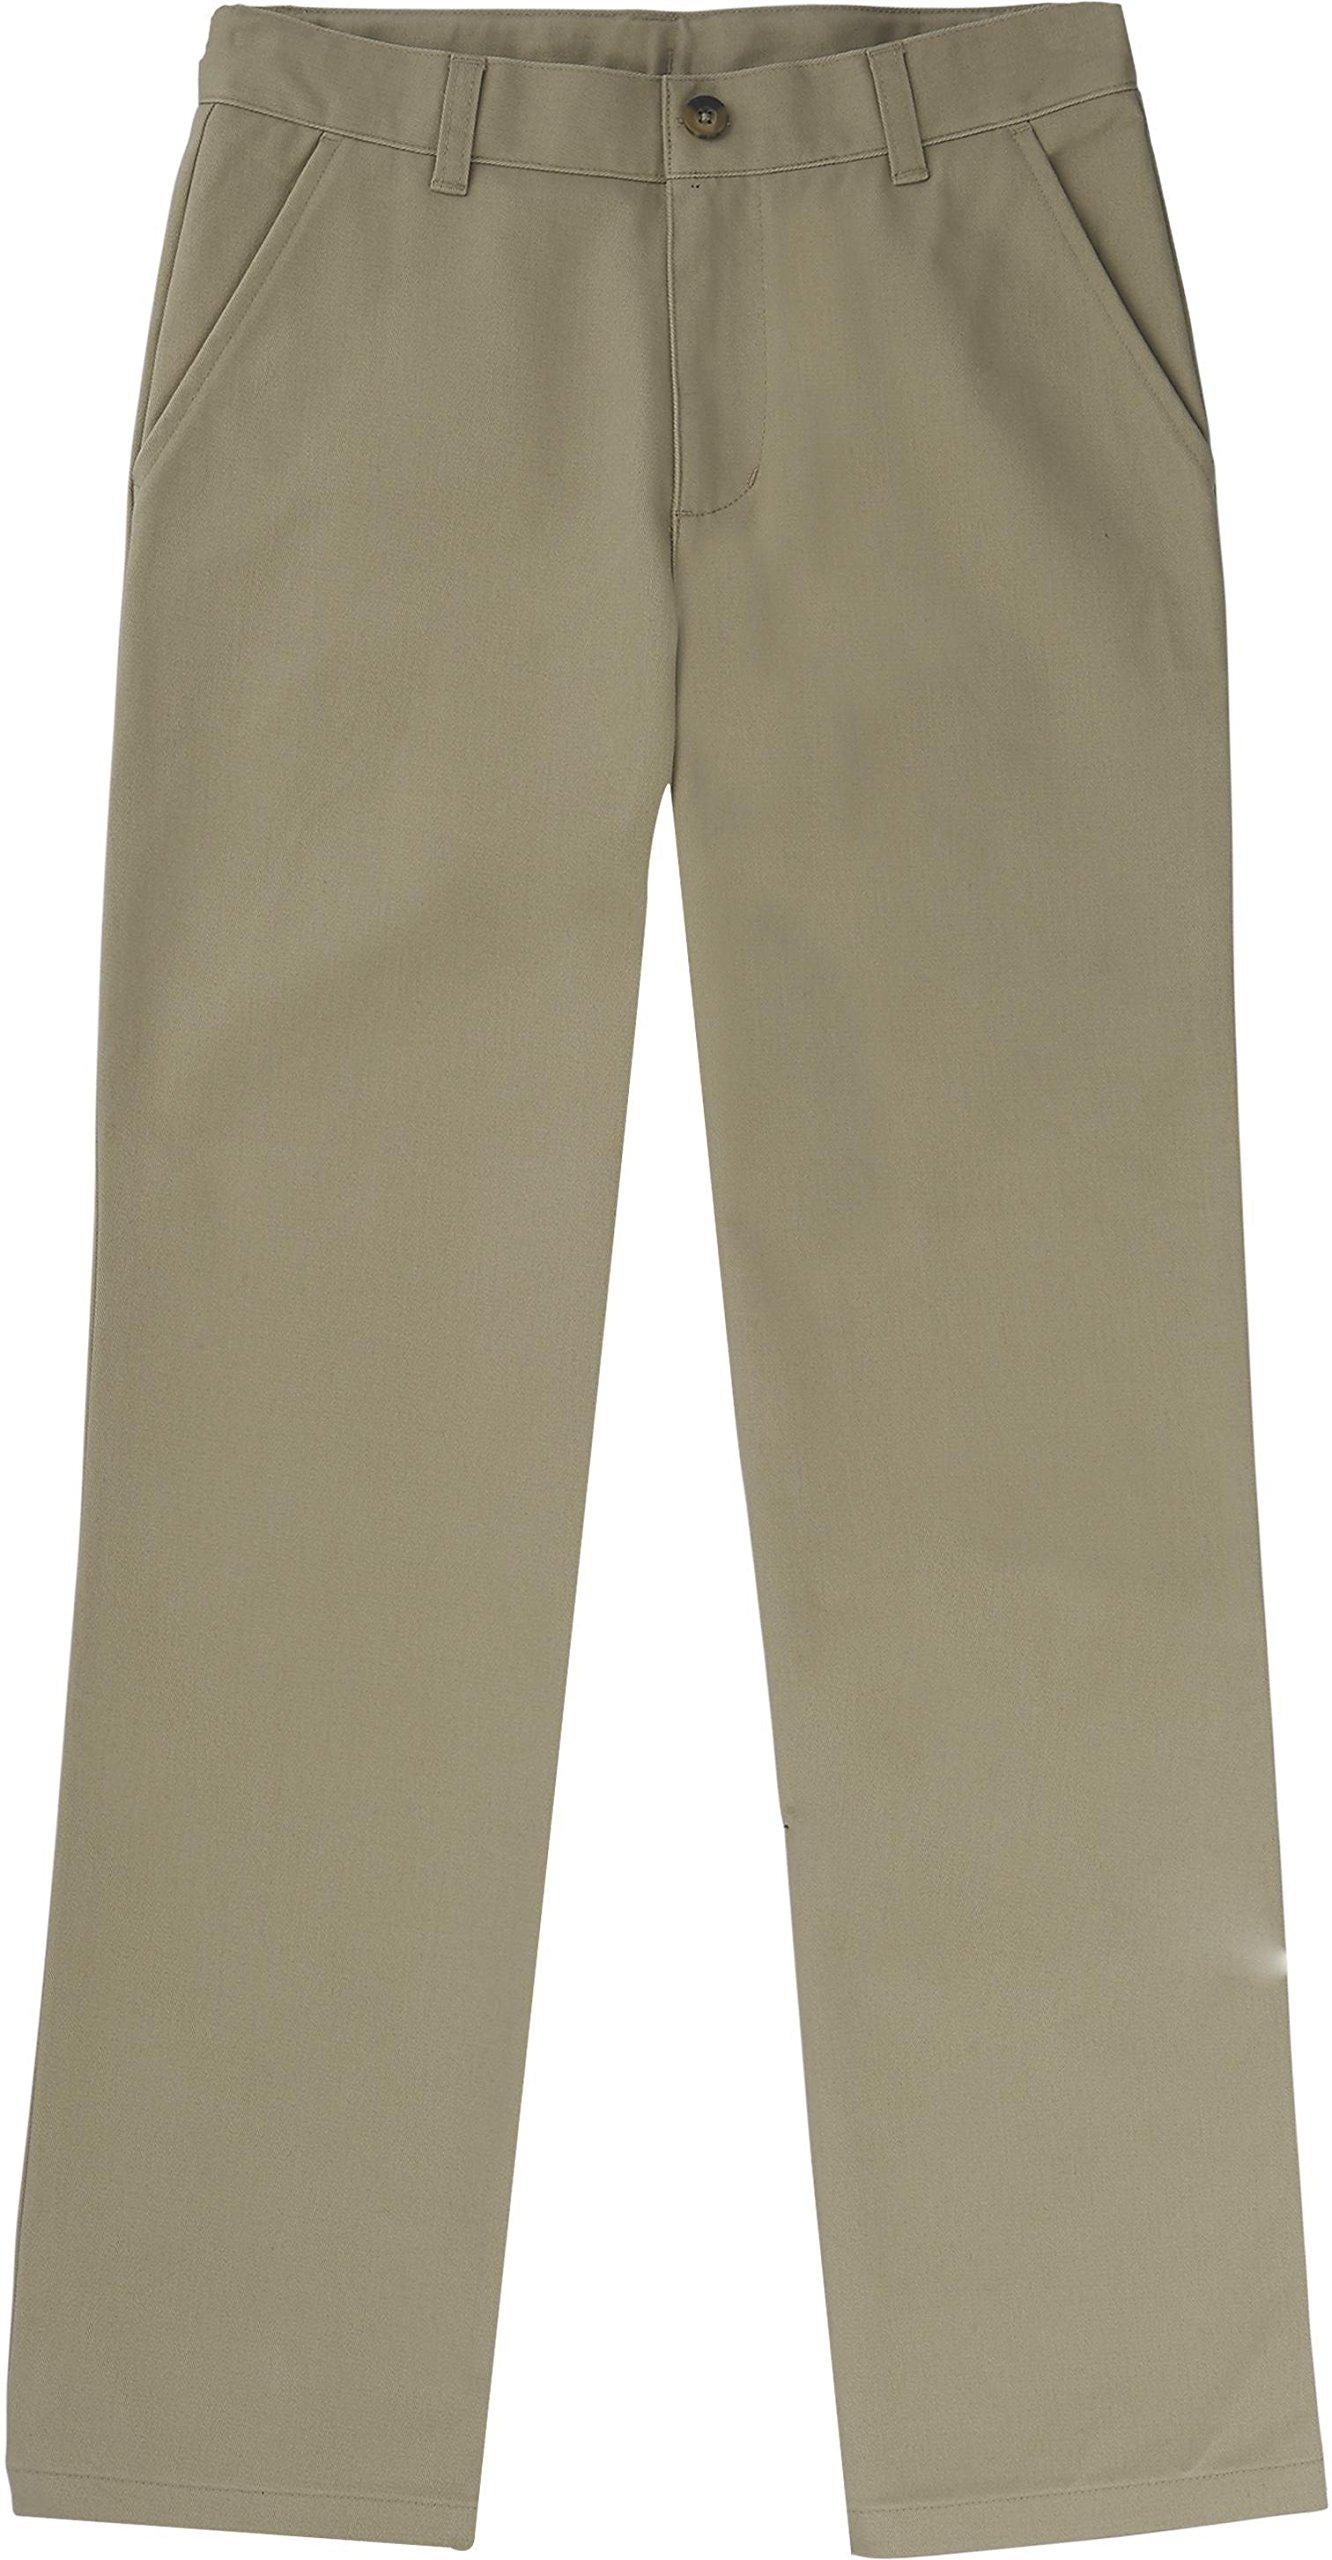 French Toast School Uniform Boys Straight Leg Twill Pants, Khaki, 18 Husky